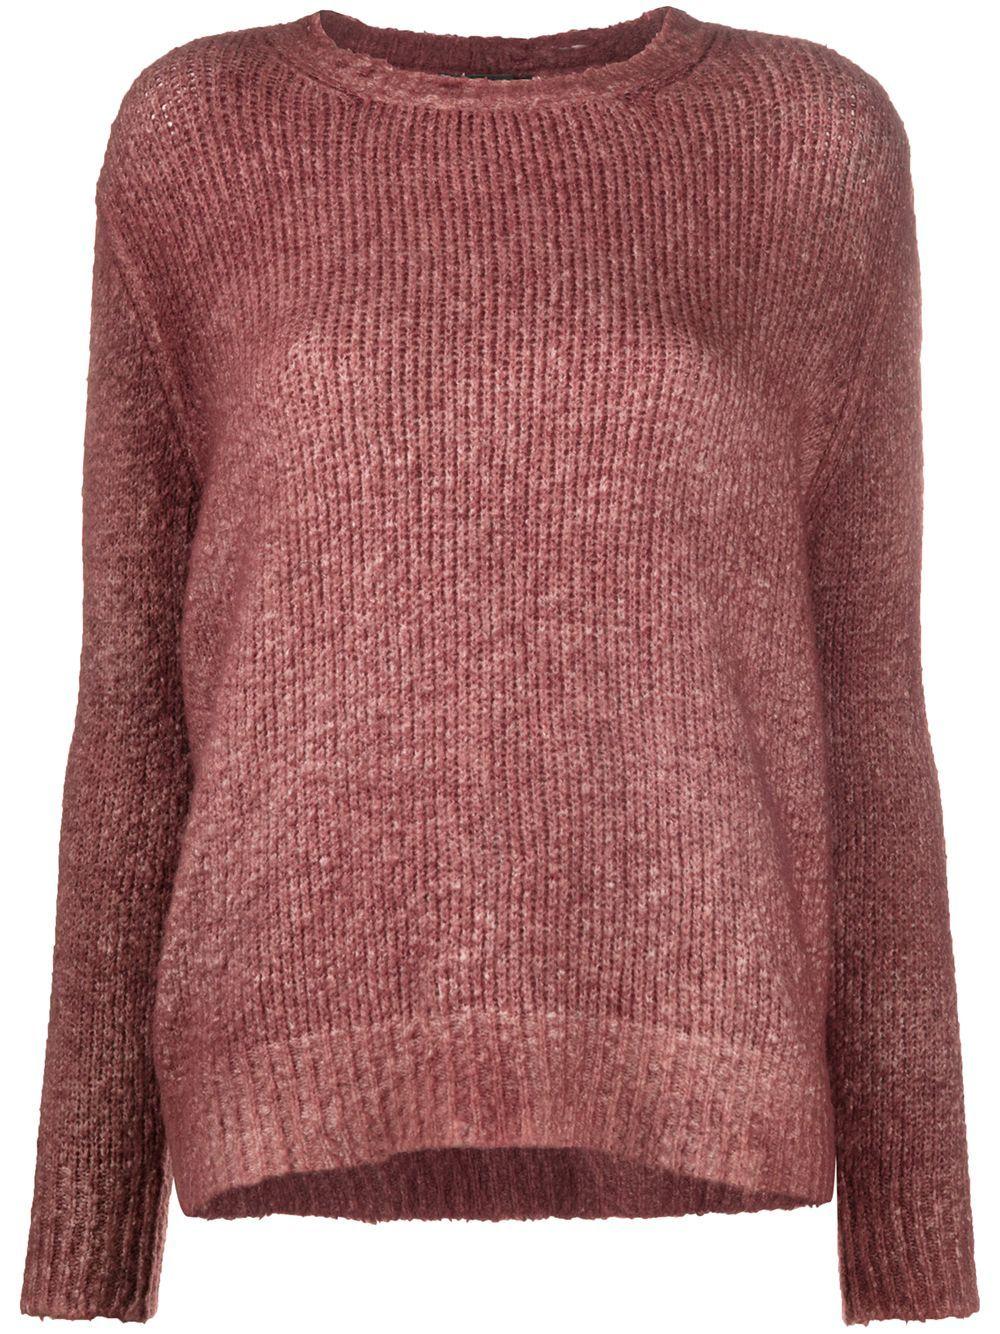 Avant Toi chunky knit jumper - Green